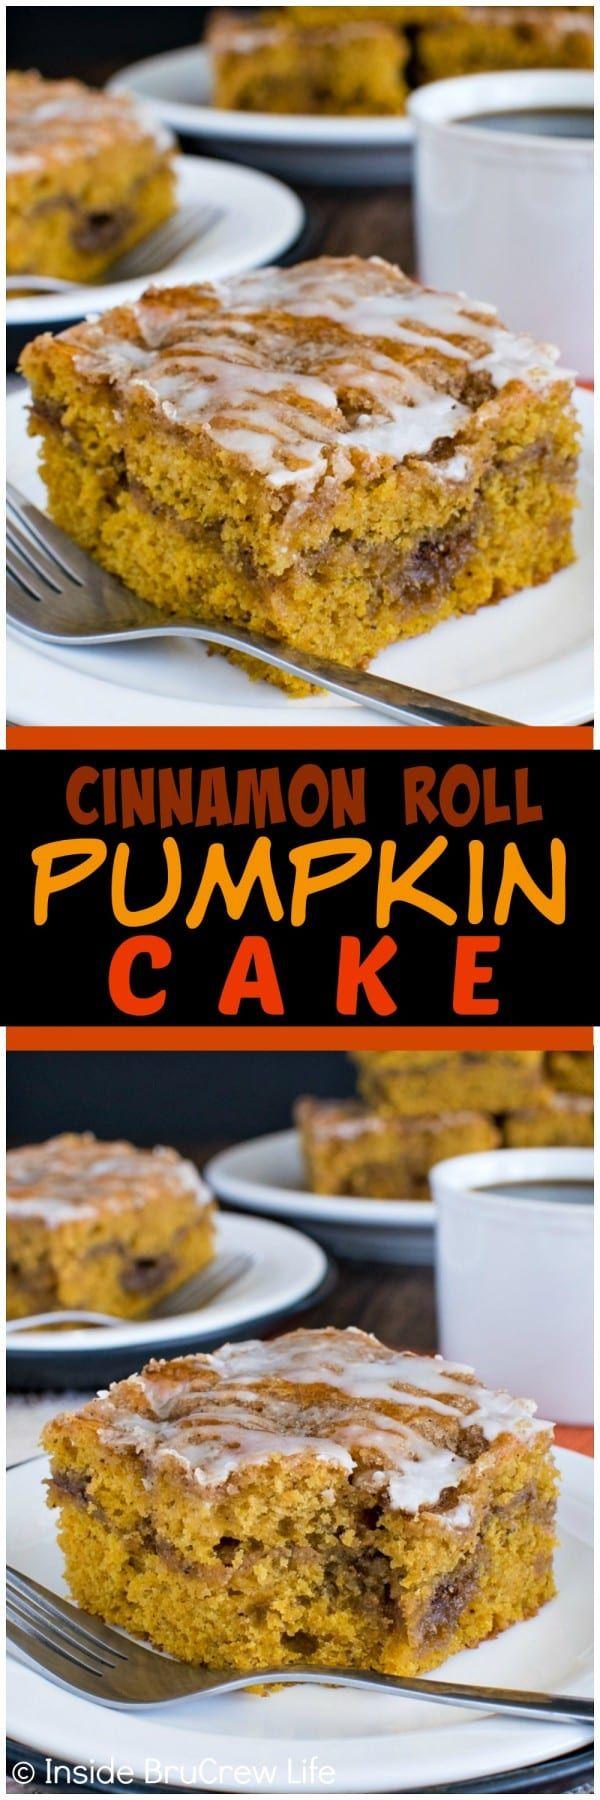 Cinnamon Roll Pumpkin Cake - pockets of cinnamon sugar make this coffee cake the best fall breakfast recipe!